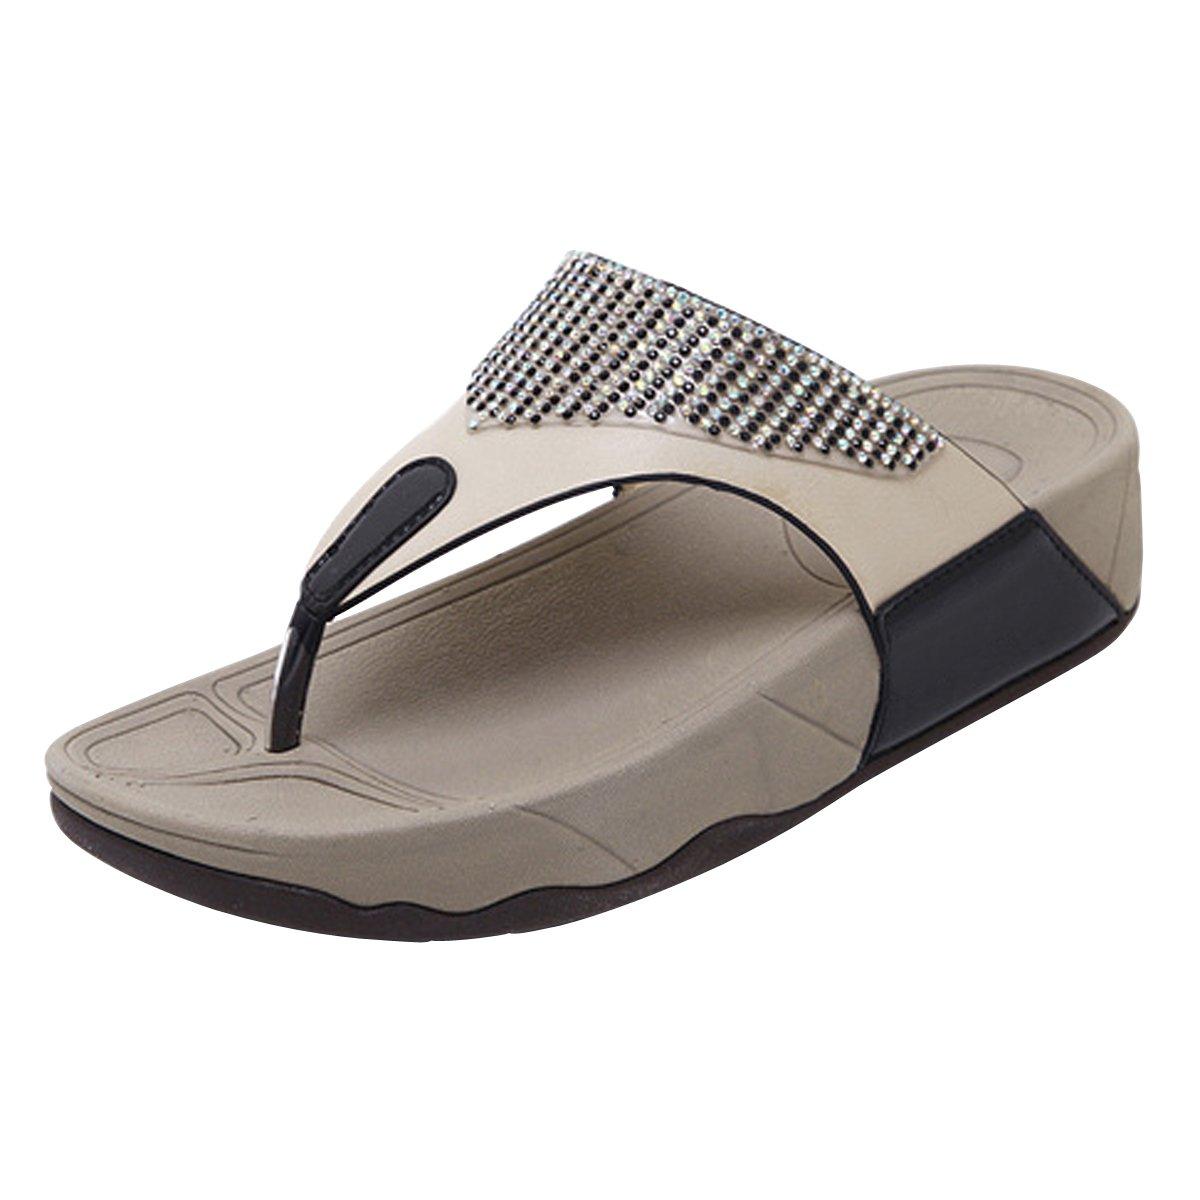 LUXINYU Women Flip Flop Sandals - Wedge Heel Beach Slides, Rhinestone Thong Sandals,Black US 9